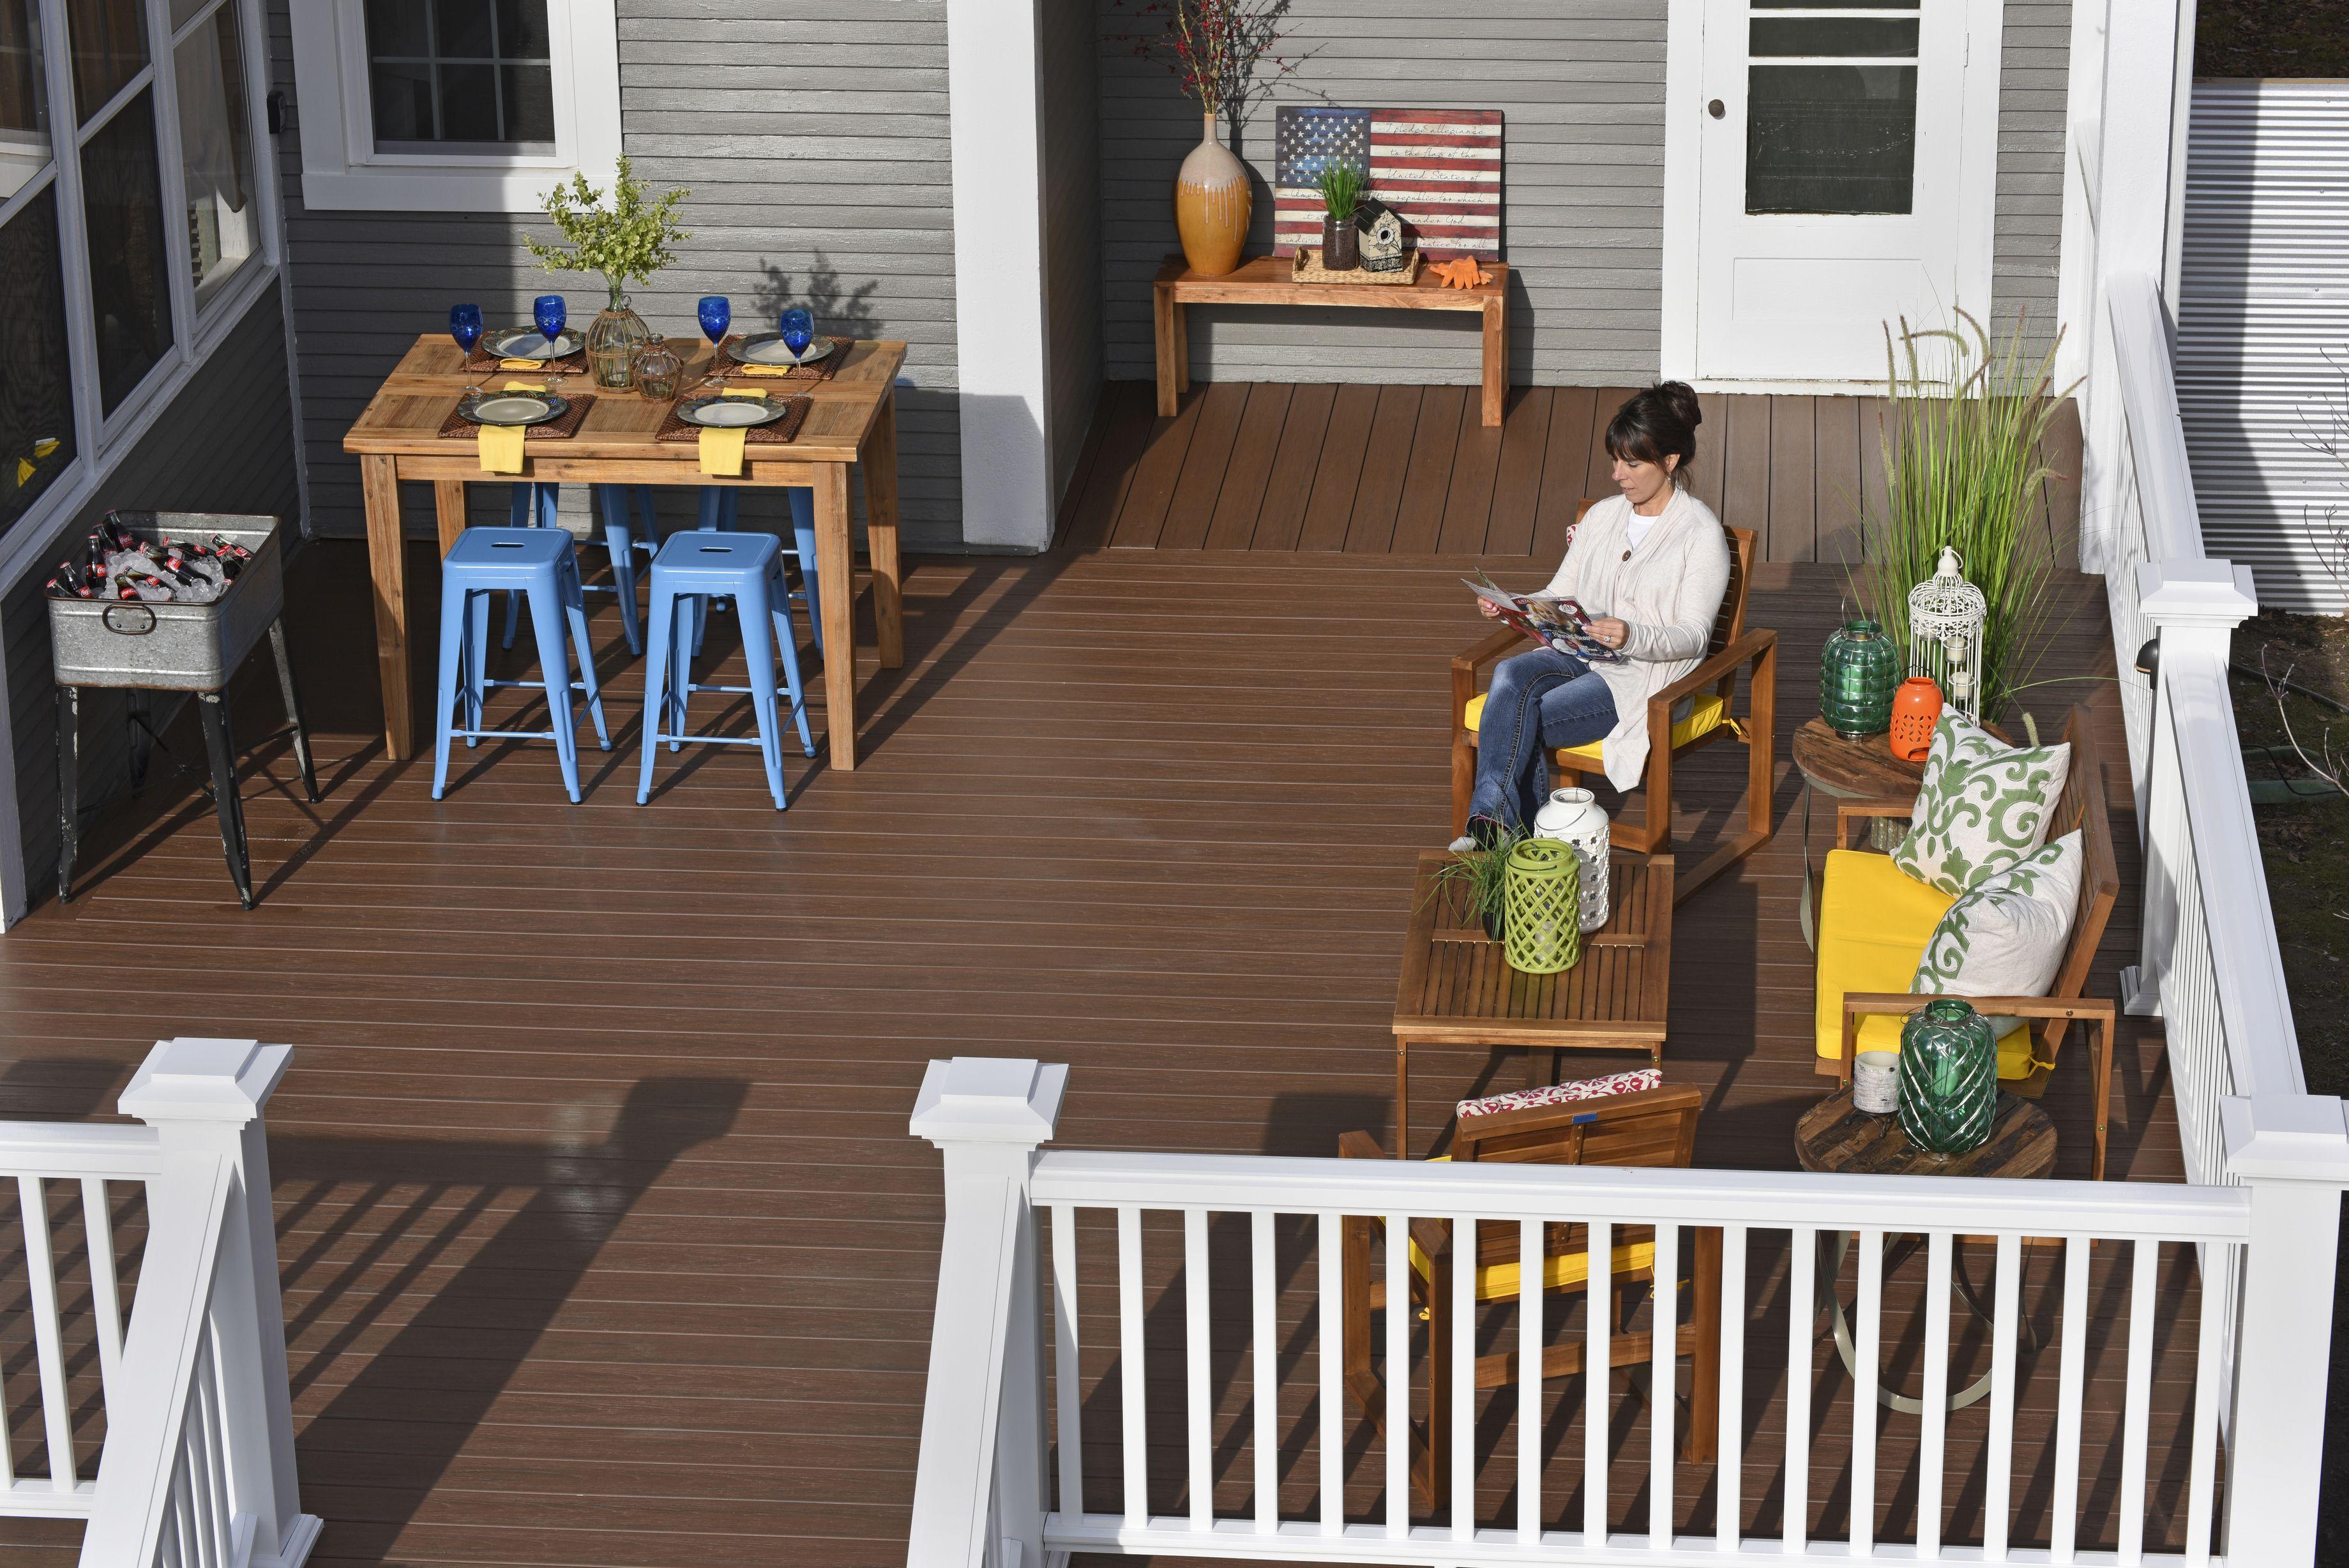 Deck makeover after shot timbertech tropical collection deck in deck makeover after shot timbertech tropical collection deck in antique palm baanklon Images